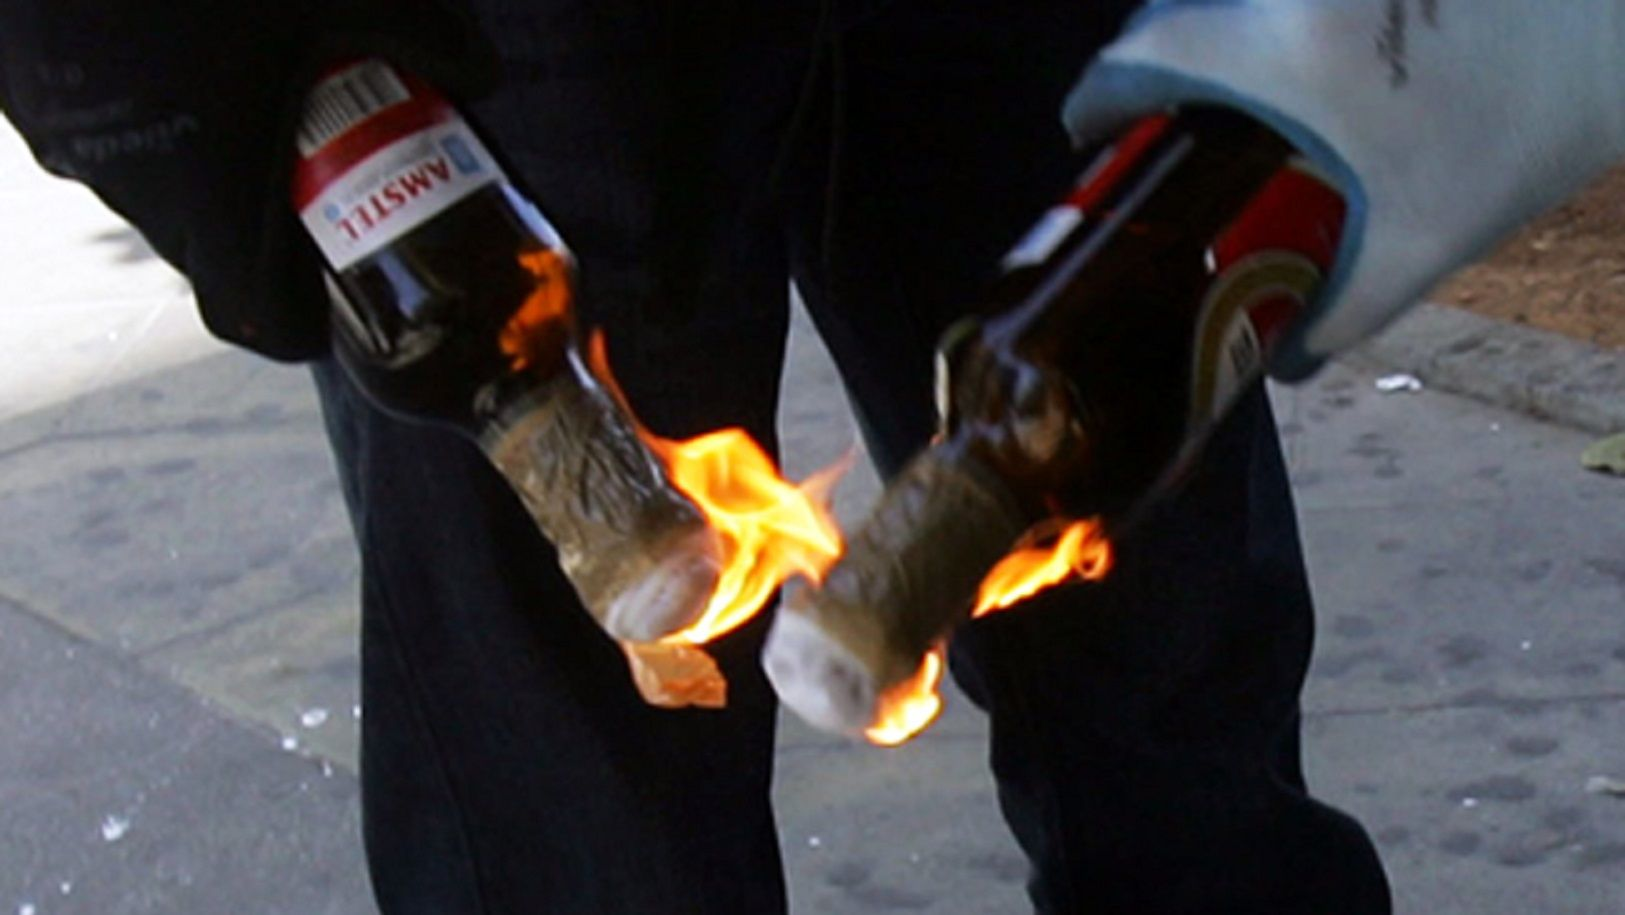 Le tiraron dos bomba molotov a una profesora